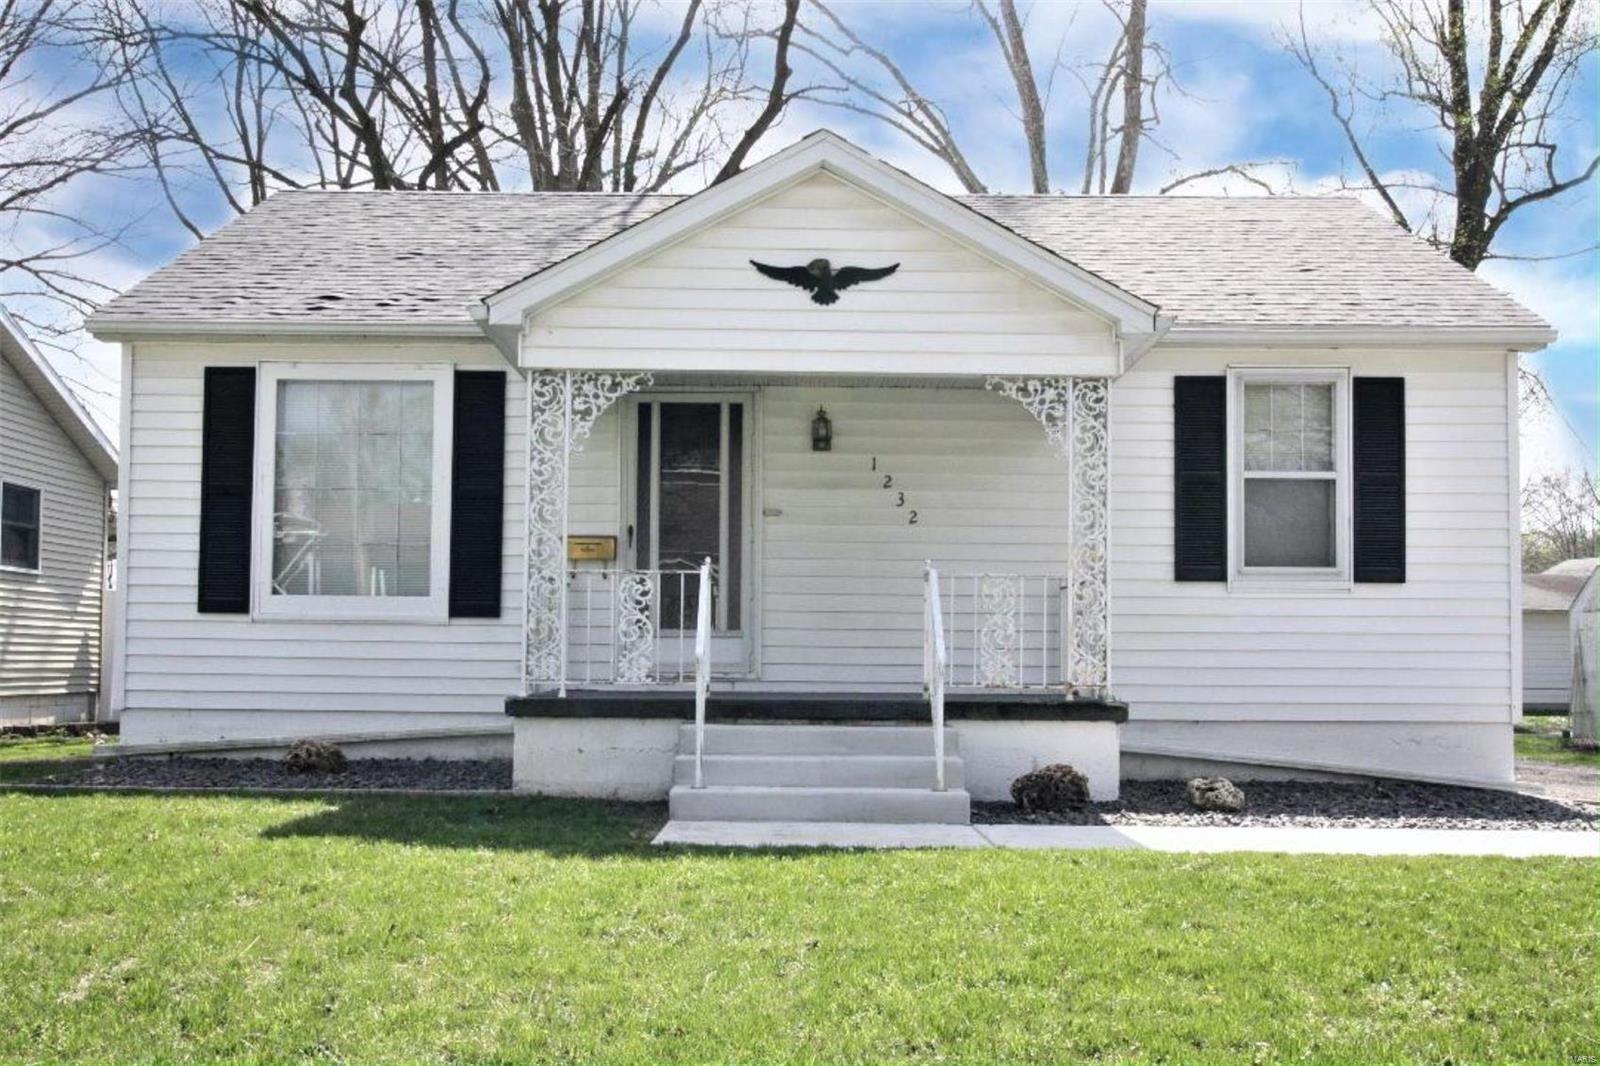 1232 McKinley Street, Mascoutah, IL 62258 - MLS#: 20021719